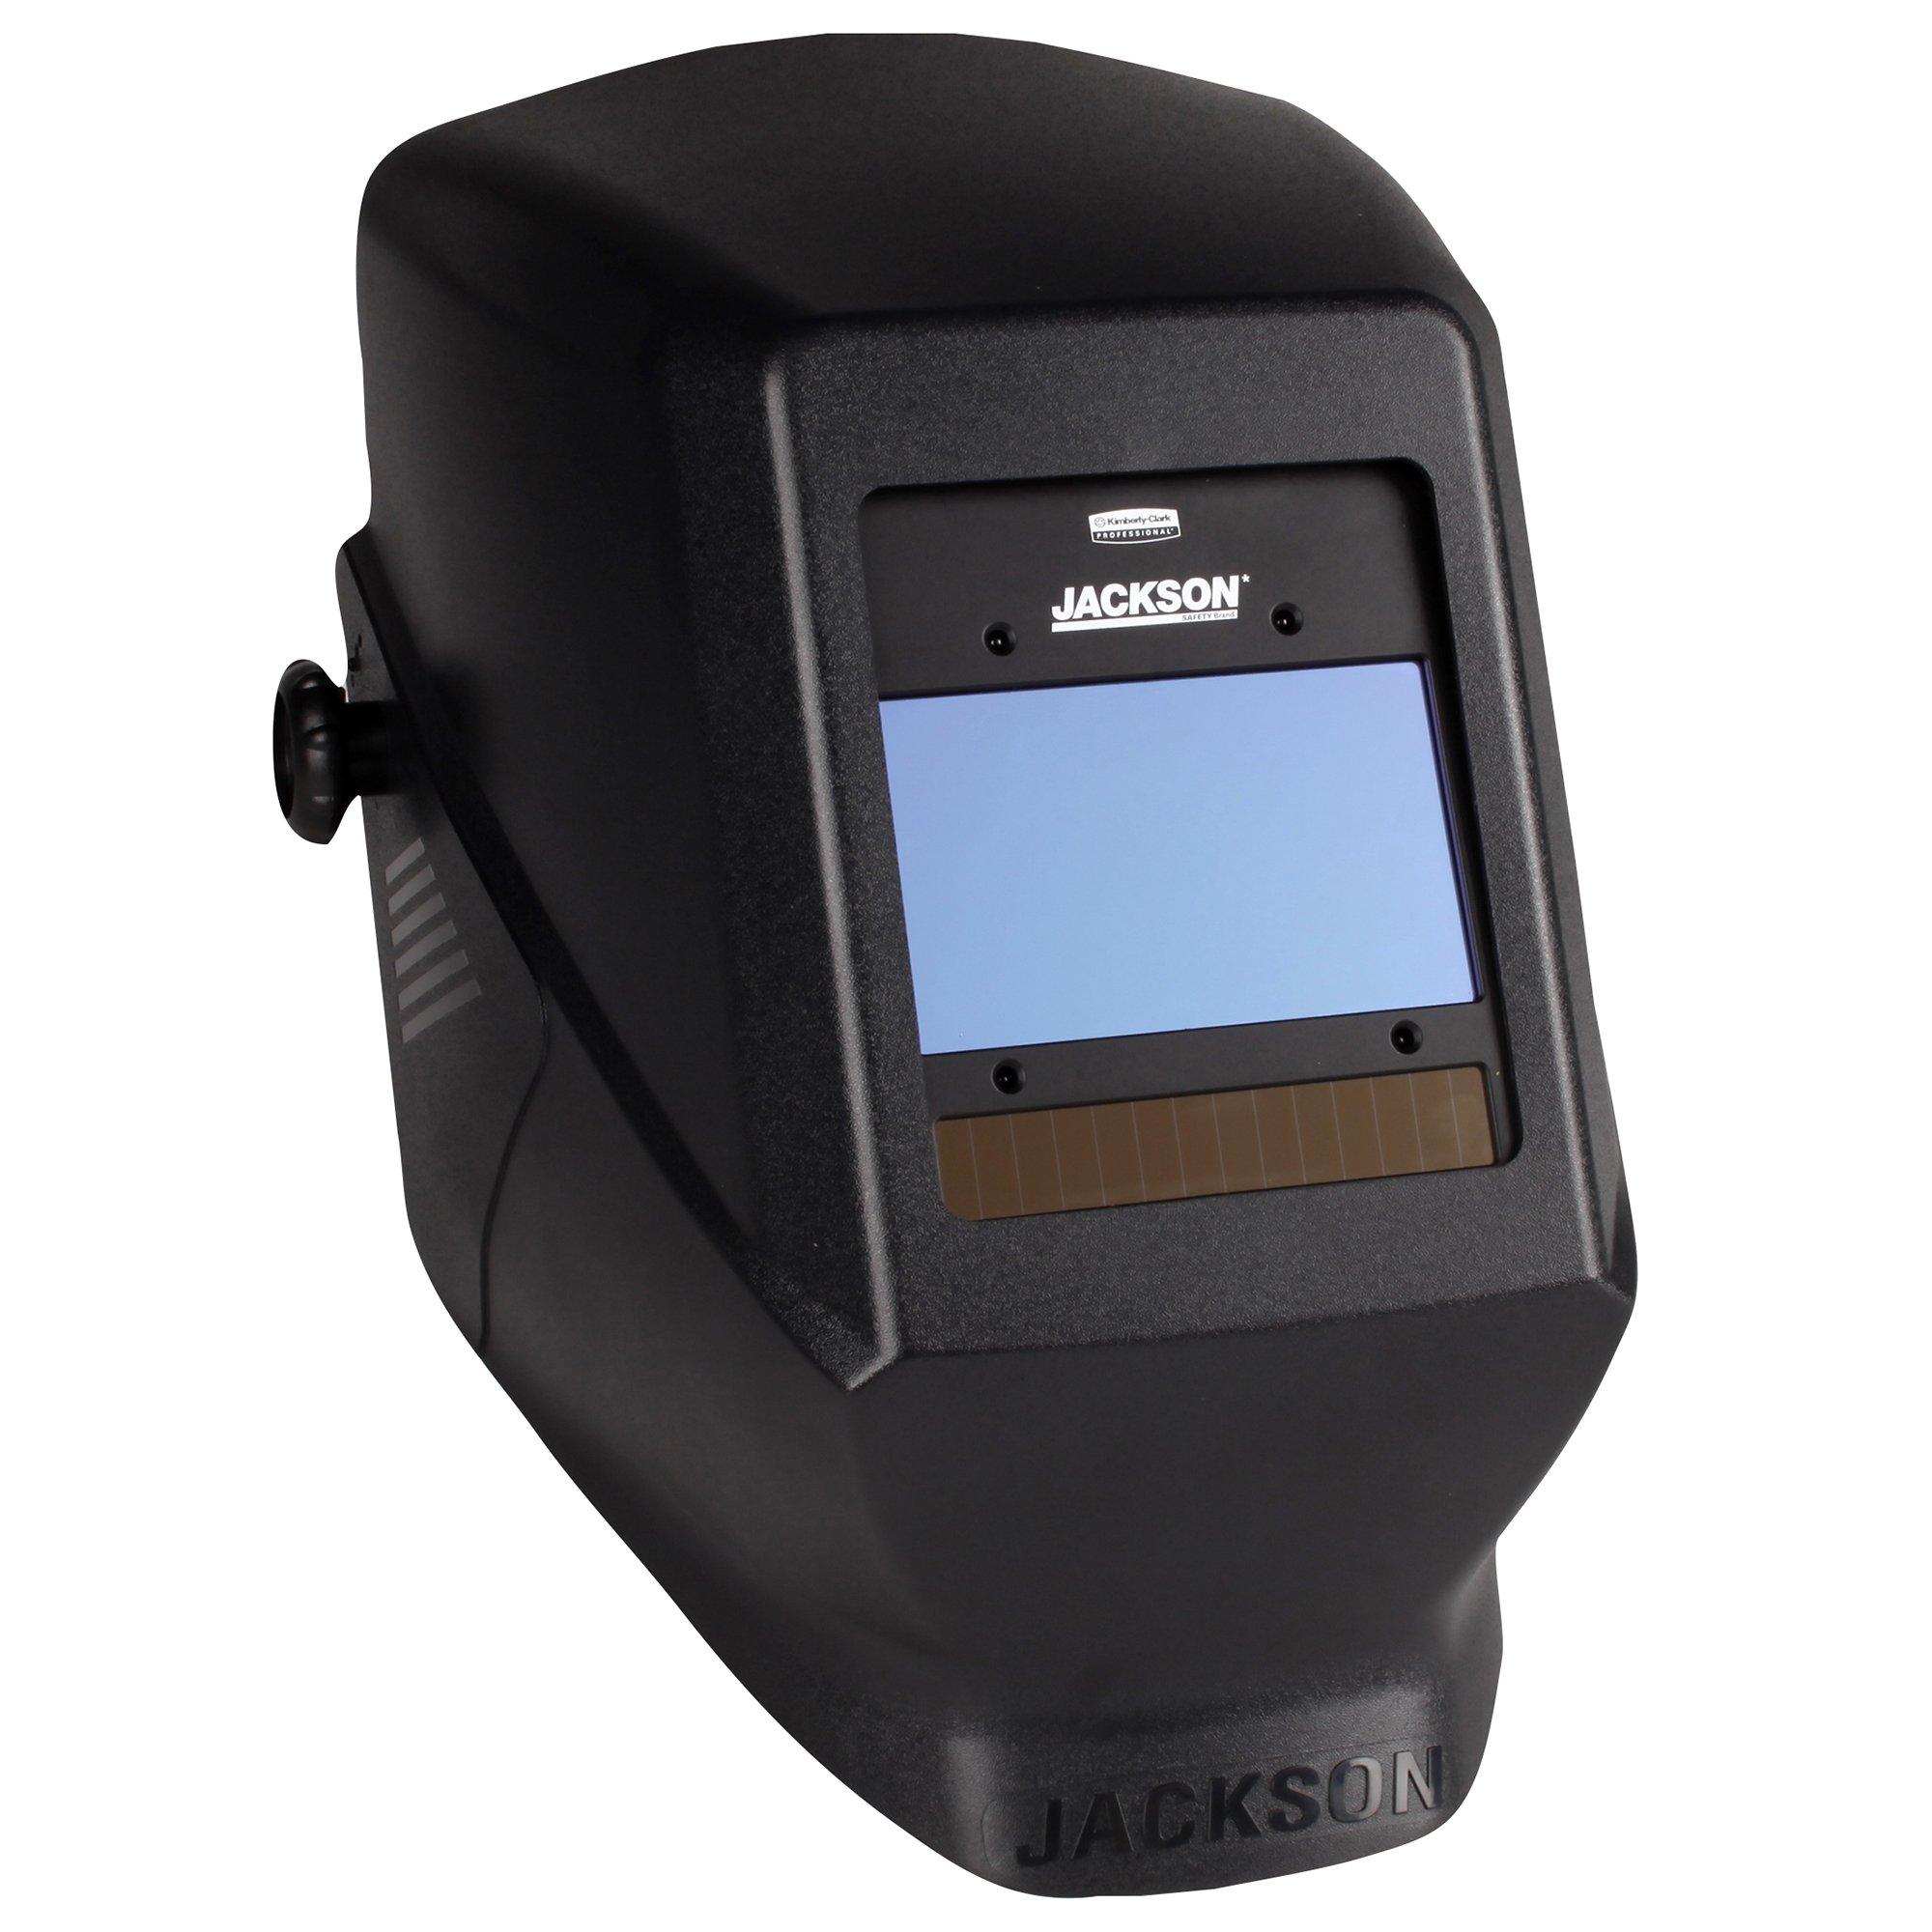 Jackson Safety Insight Variable Auto Darkening Welding Helmet, HSL100 (46129), Black, 1 Helmet / Order